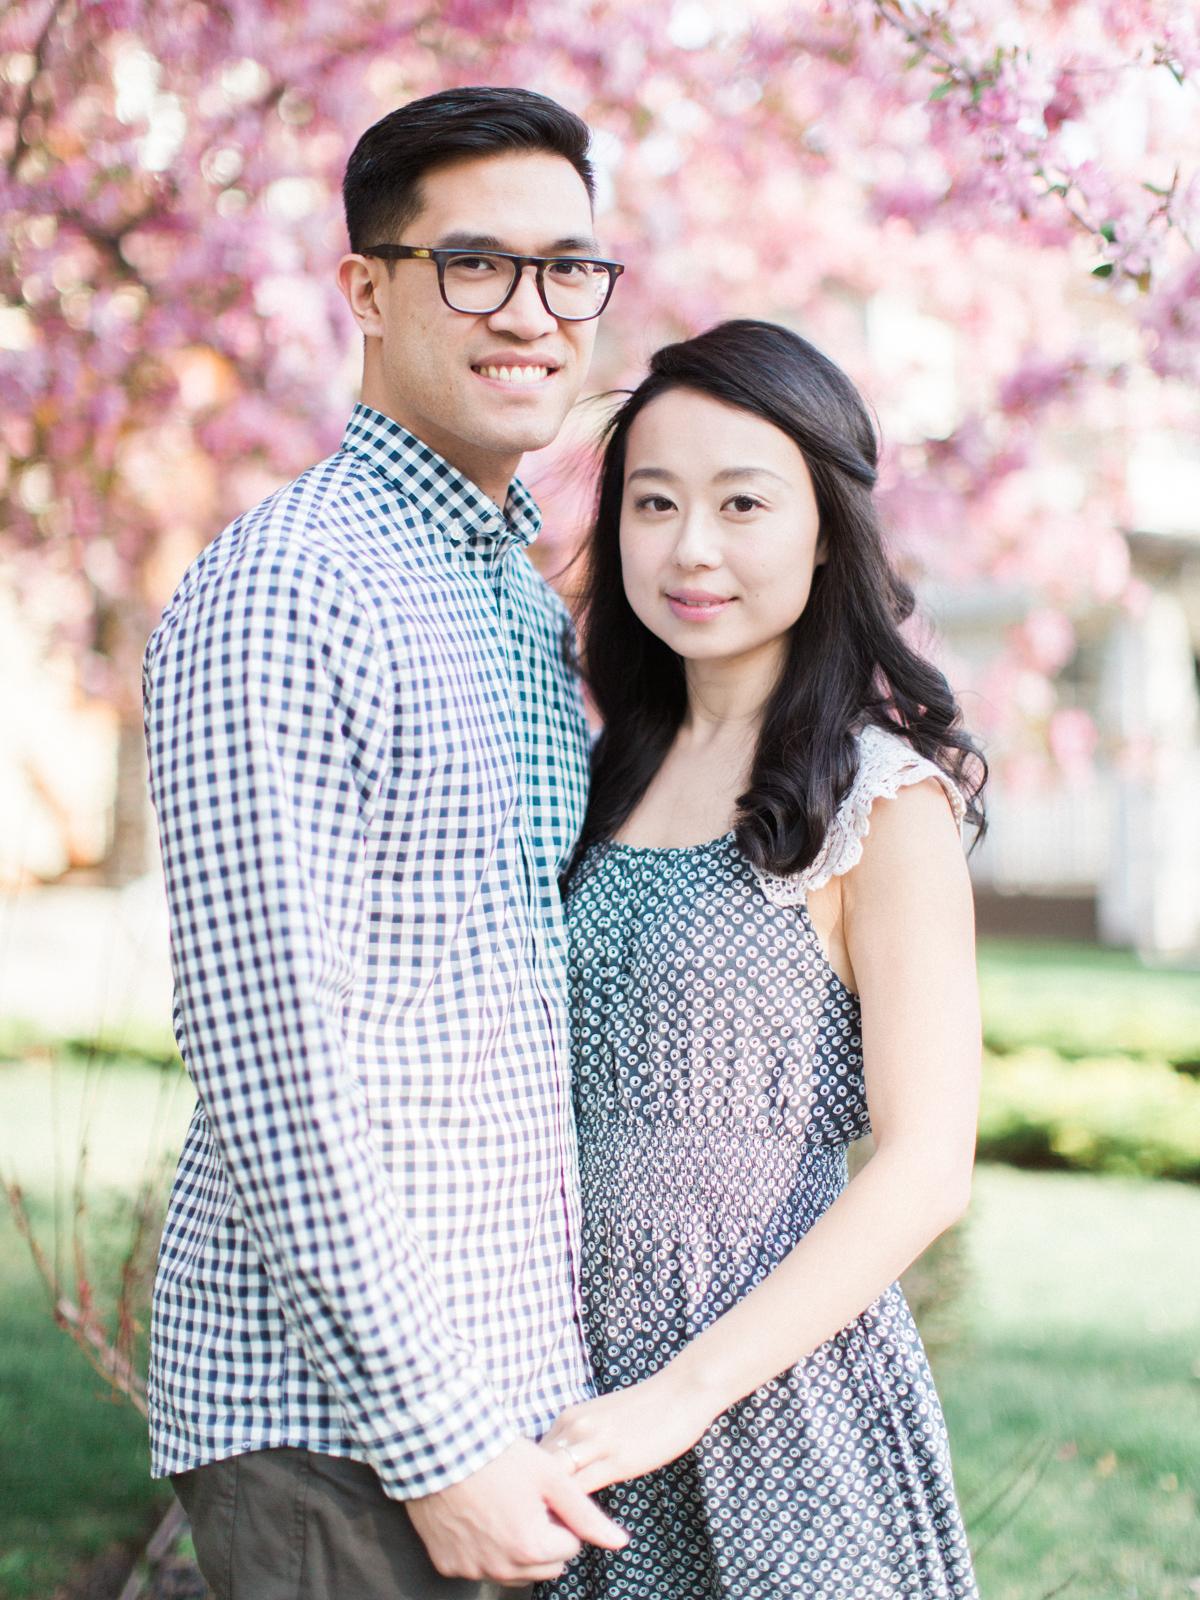 Calgary-wedding Photography-spring-engagement-cherry-tree-2.jpg